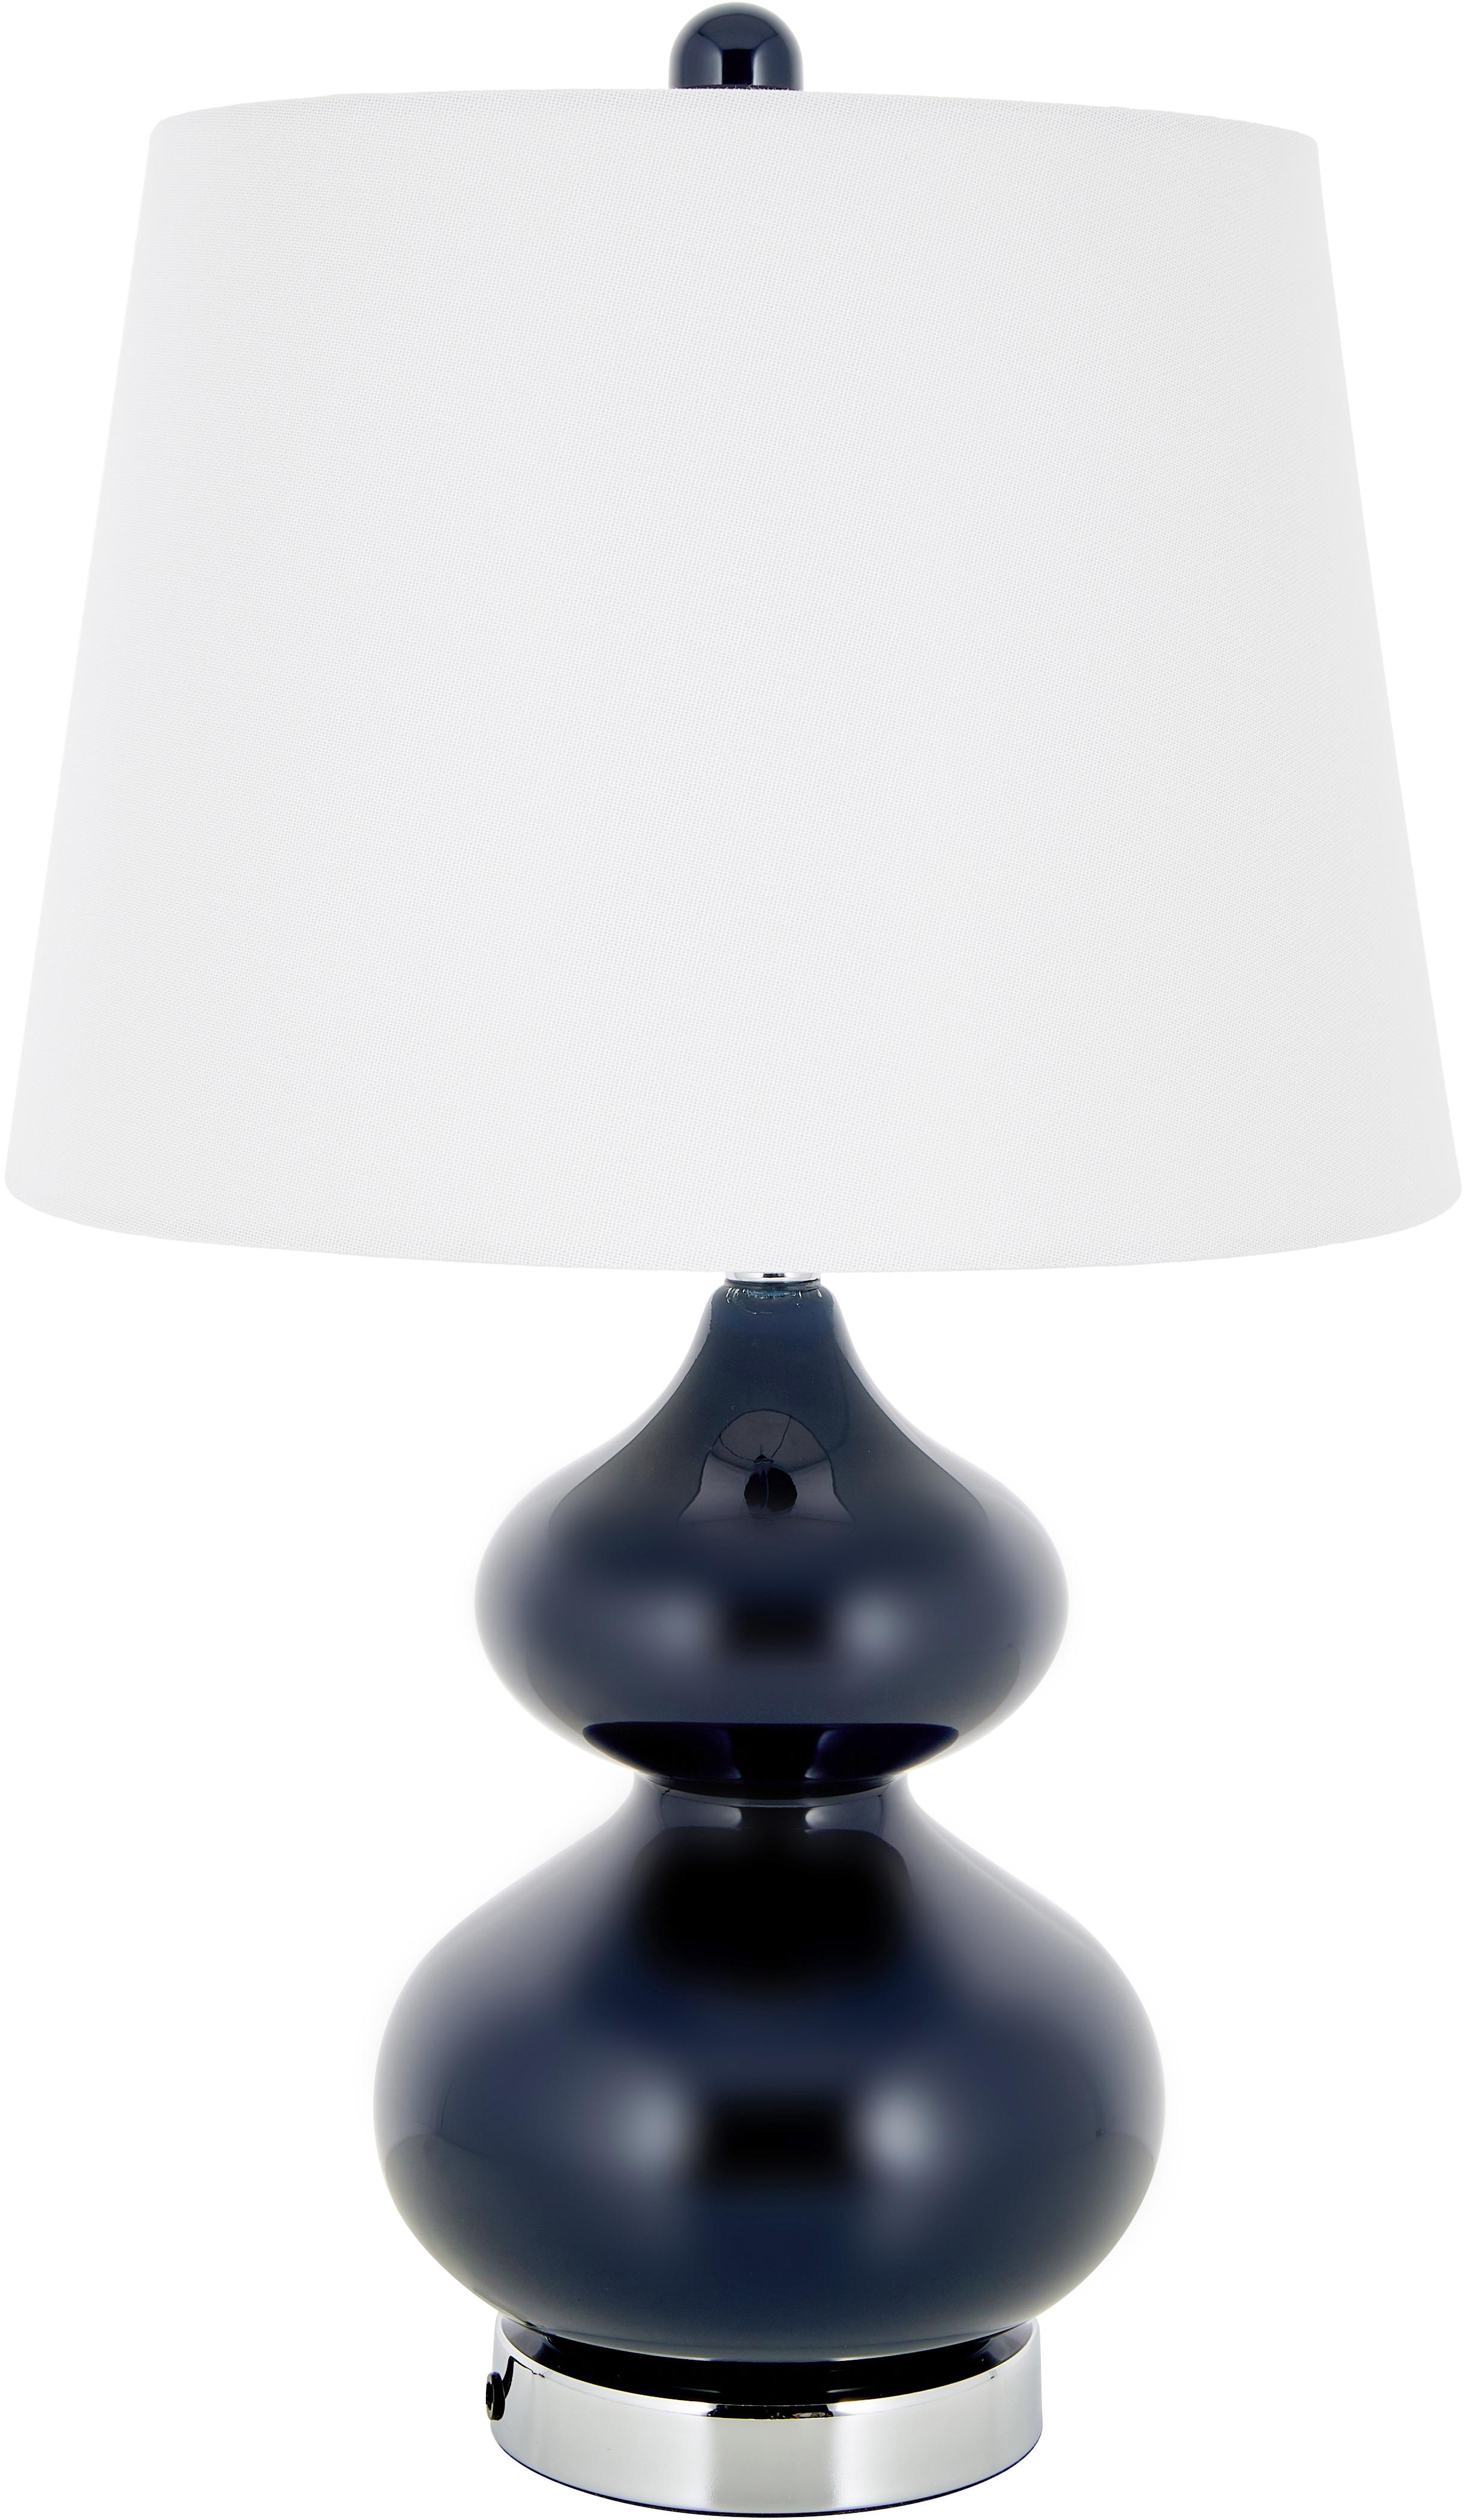 Grosse Tischlampen Felicitas, 2 Stück, Lampenschirm: Baumwolle, Sockel: Metall, Blau, Ø 35 x H 58 cm